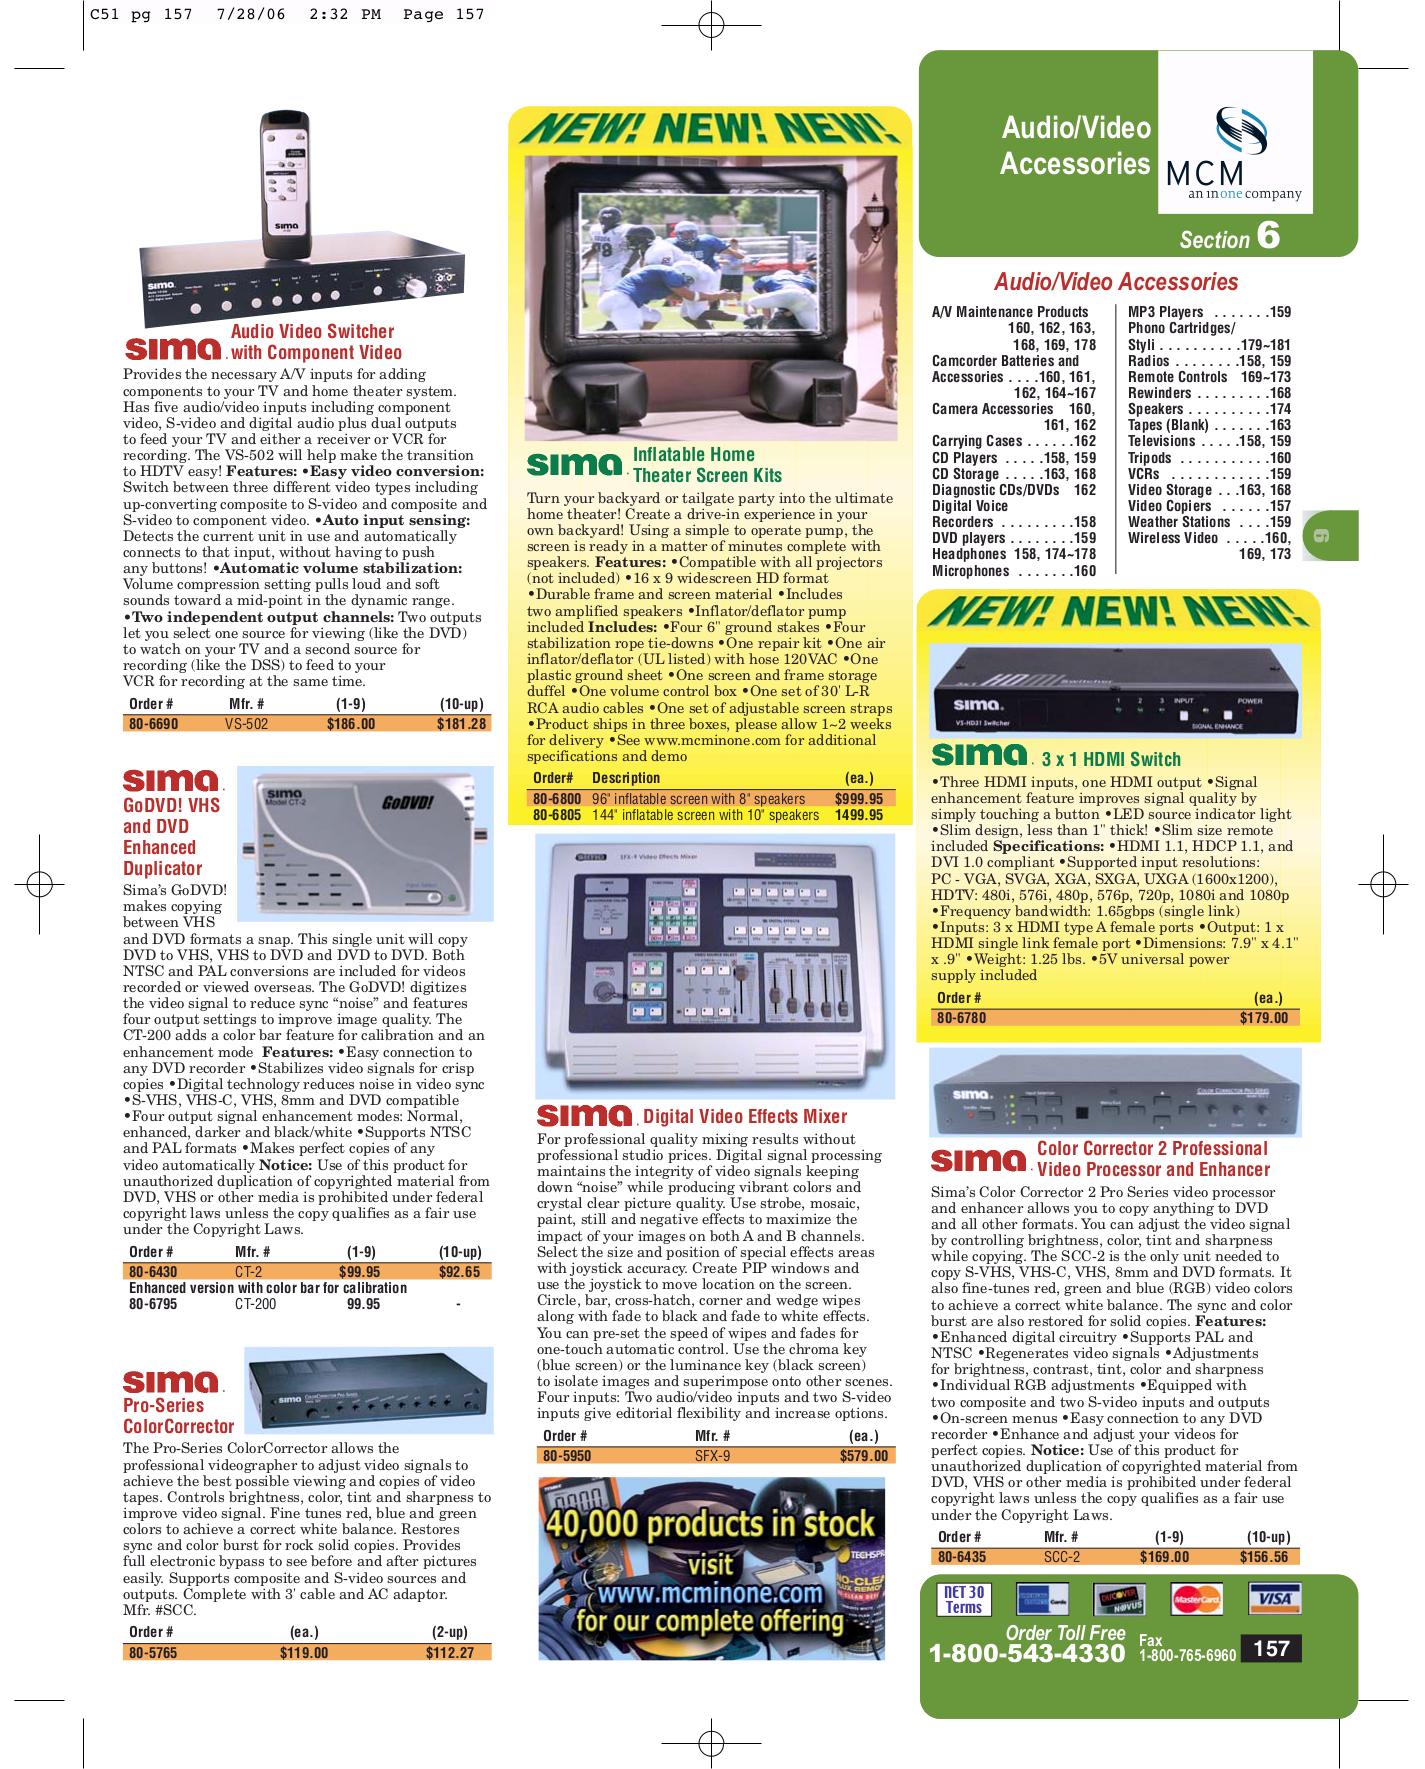 download free pdf for svp dv 6305 camcorders manual rh umlib com Vacuum Cleaner Manual